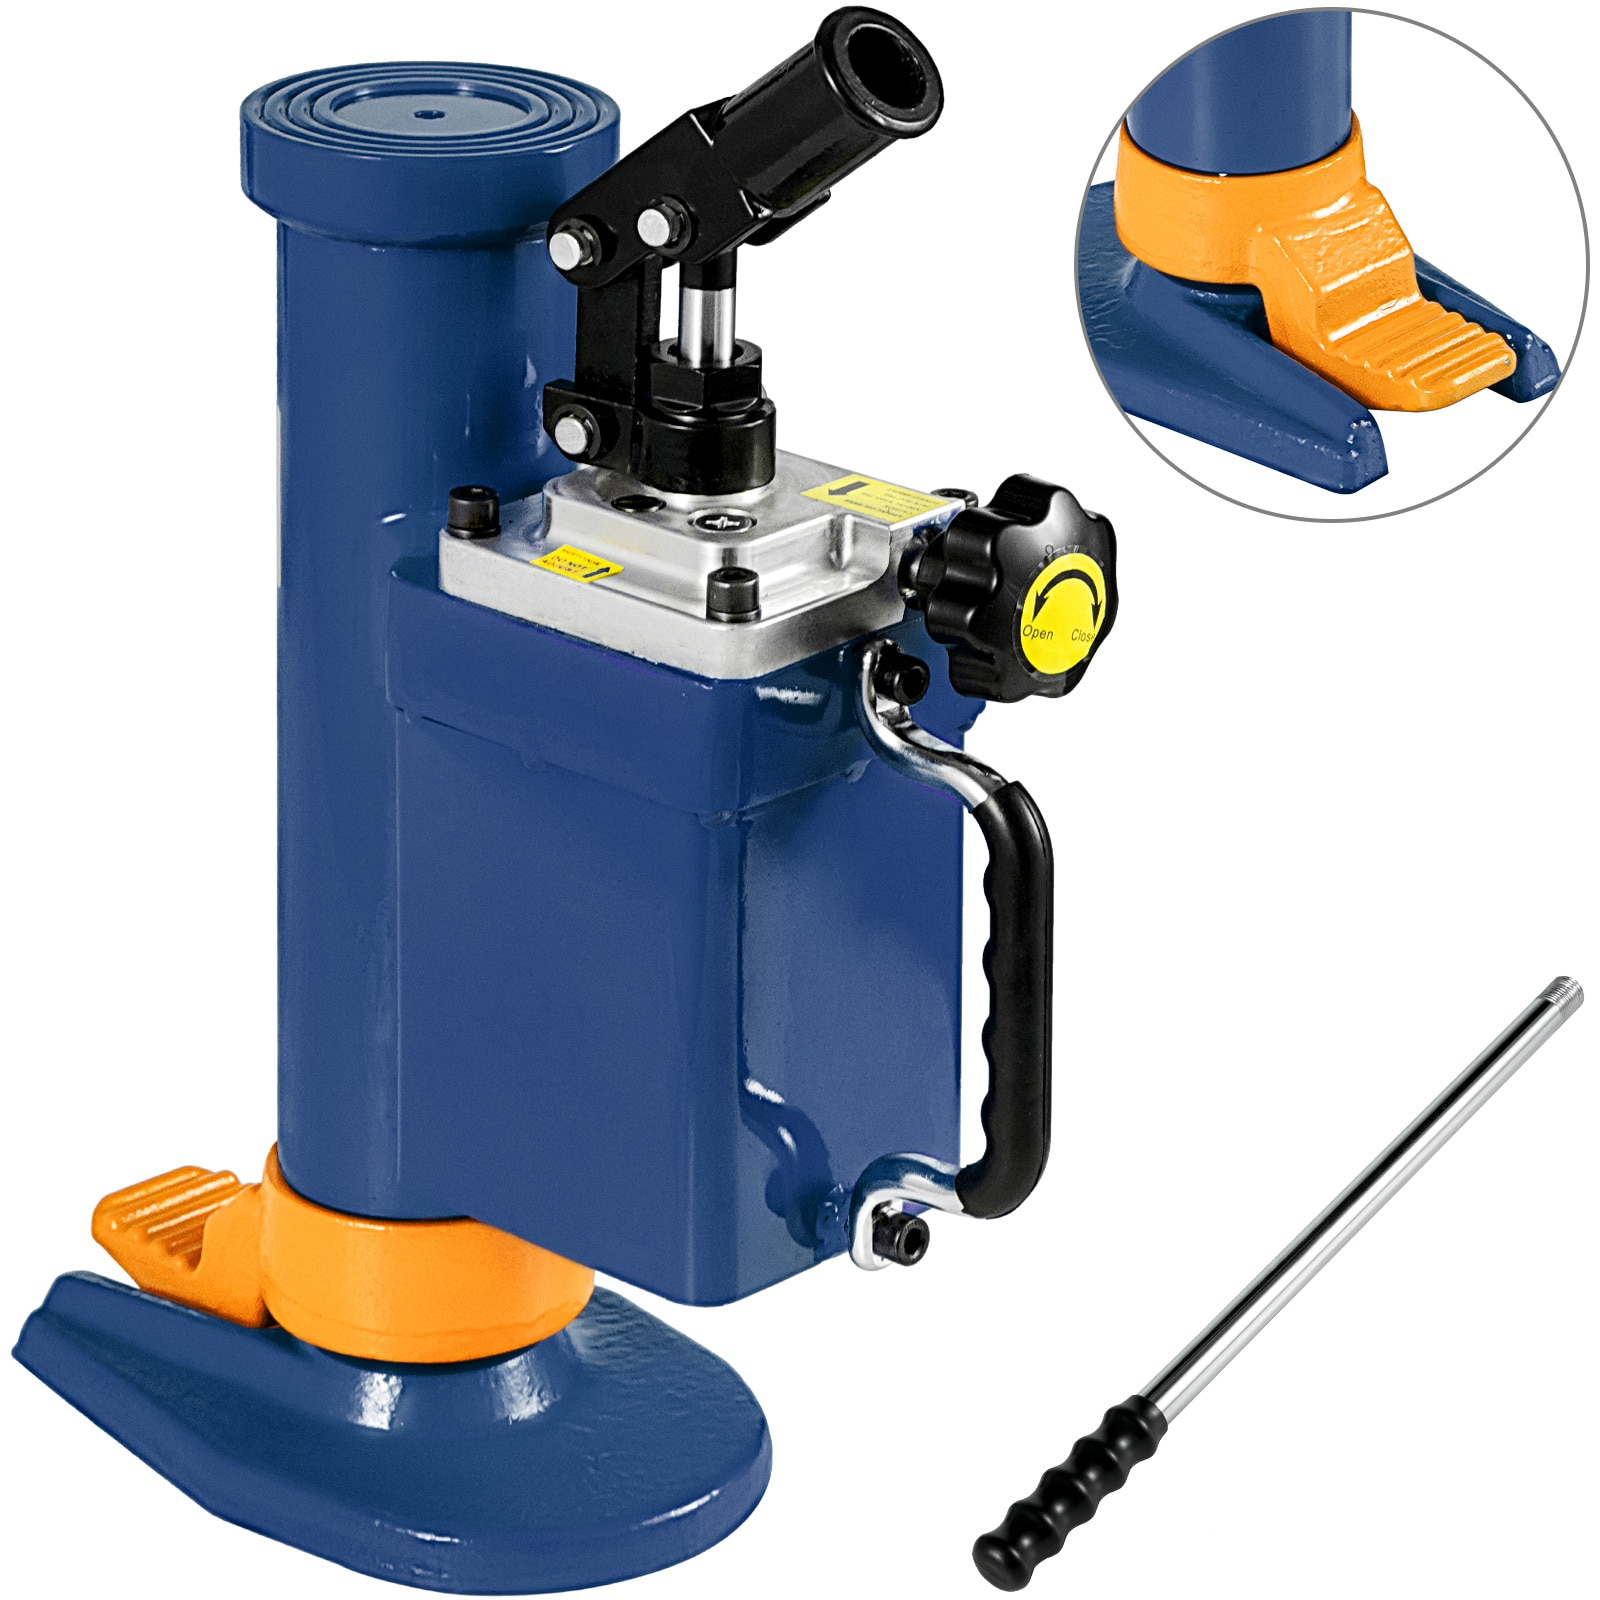 5T Portable Hydraulic Toe Bottle Car Jack Manual Machine With Rotating Shell Lifting Vehicle Mechanical Maintenance Equipment